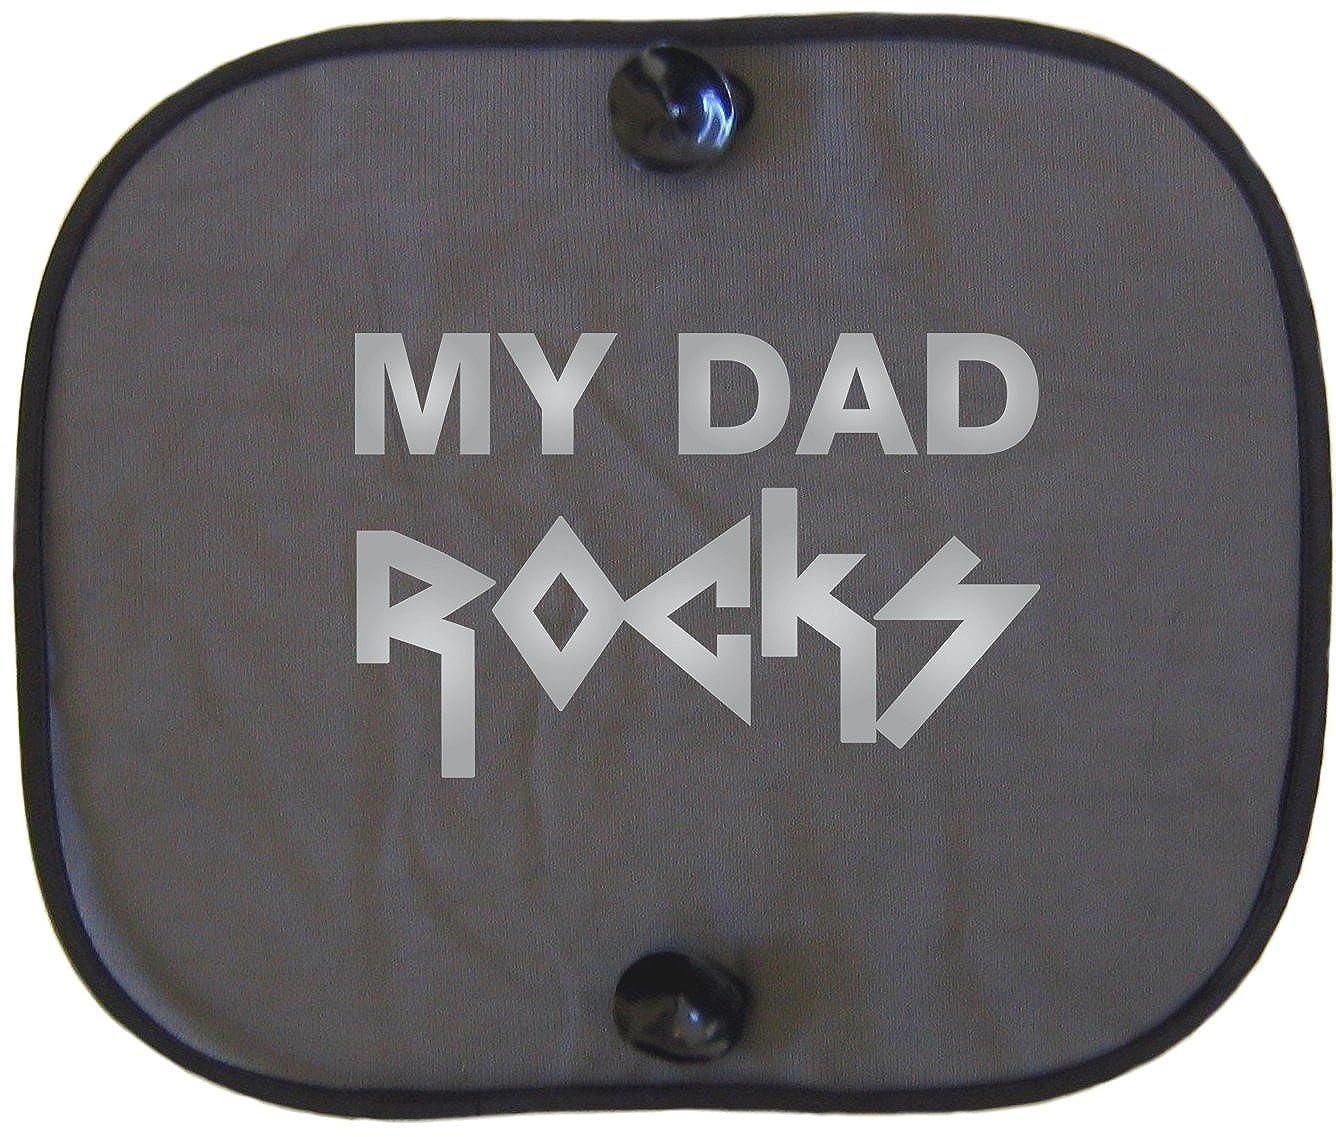 My Dad Rocks Silver Car Sun Protector for Kids